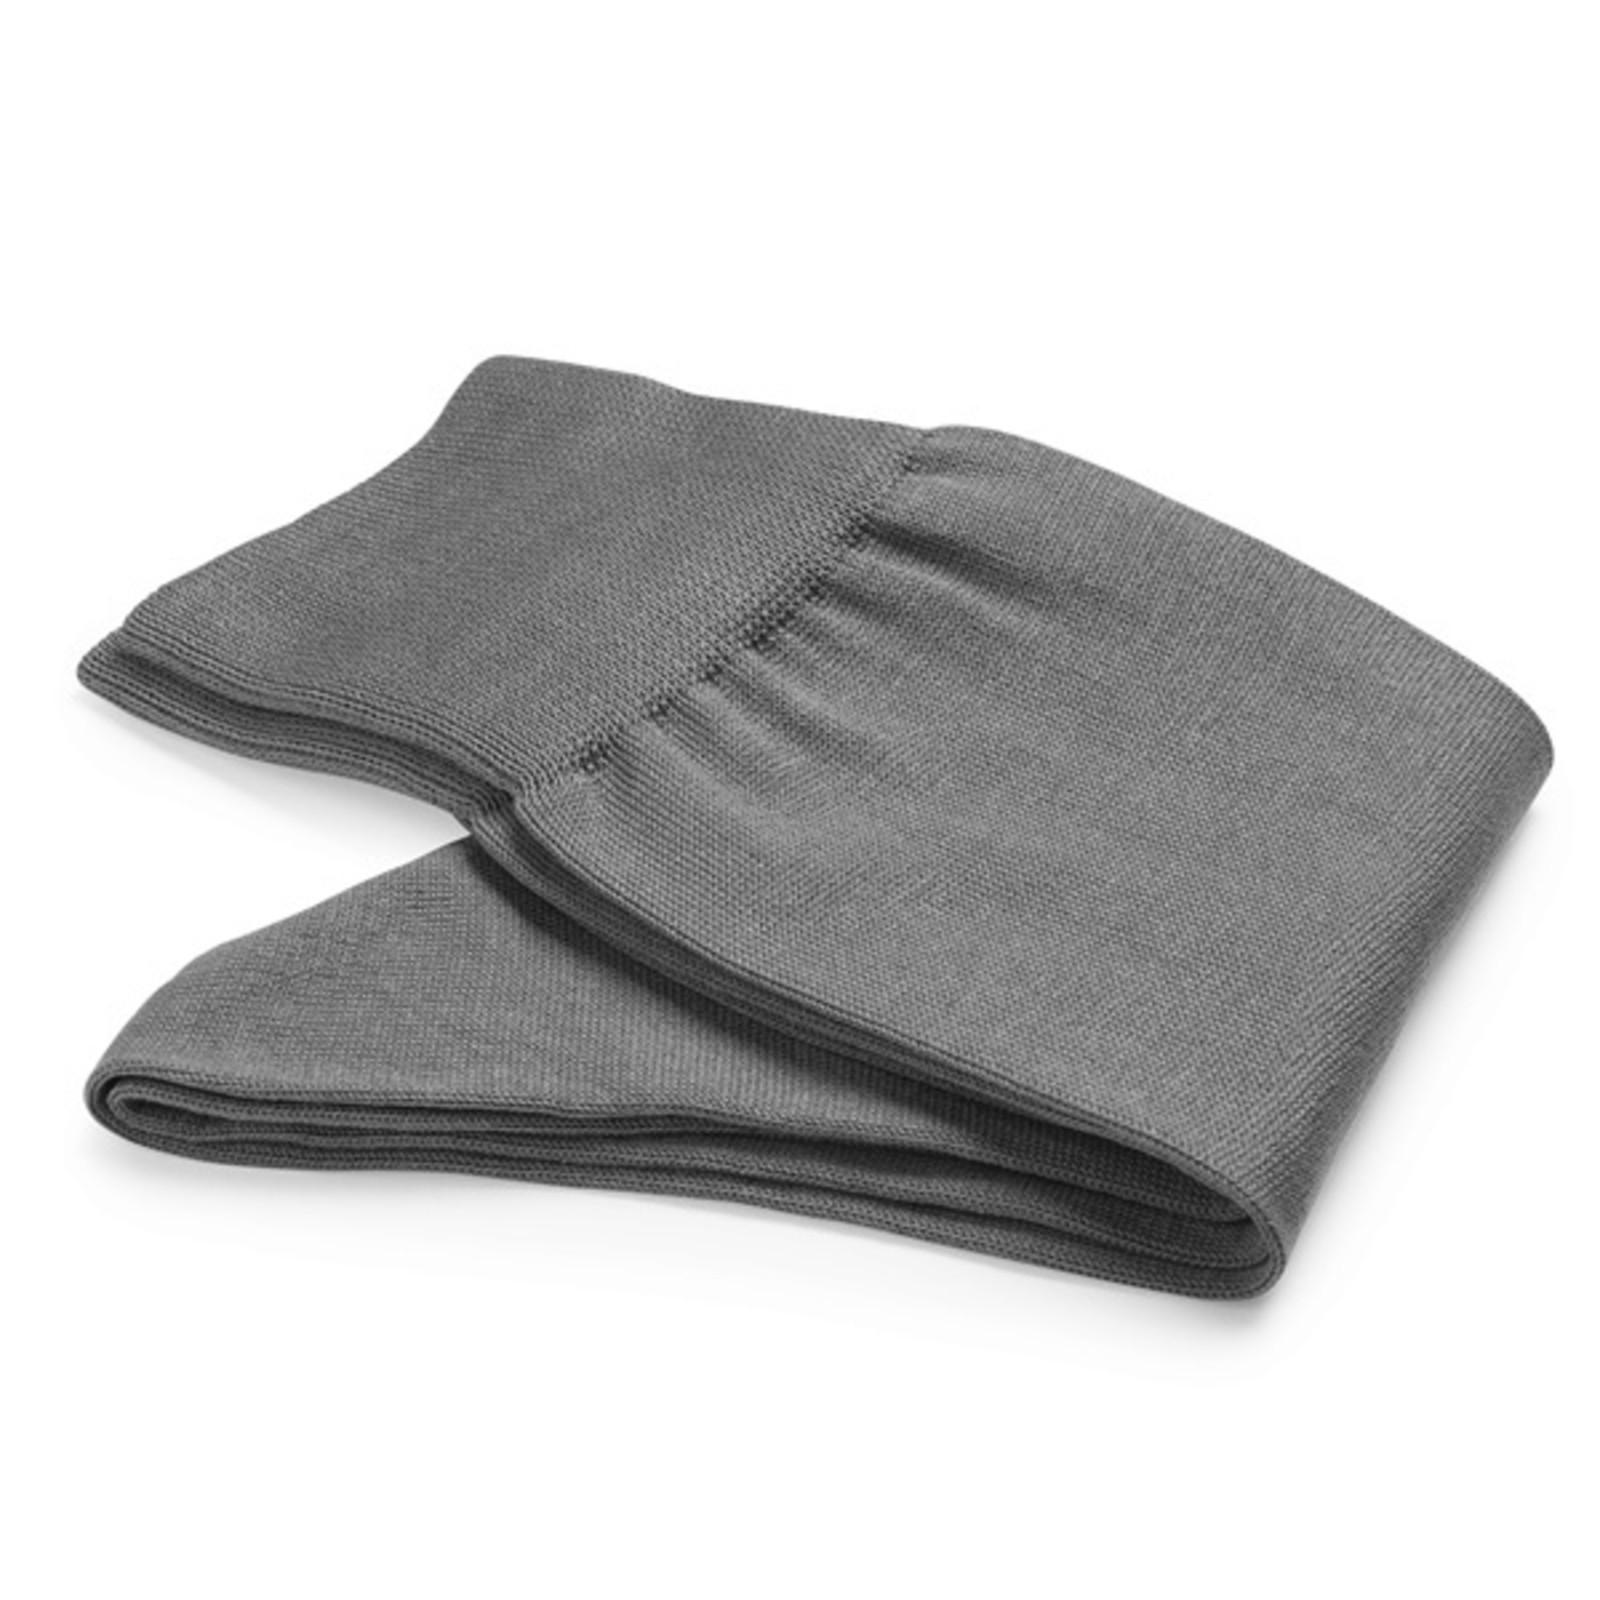 Carlo Lanza Graue Socken Baumwolle